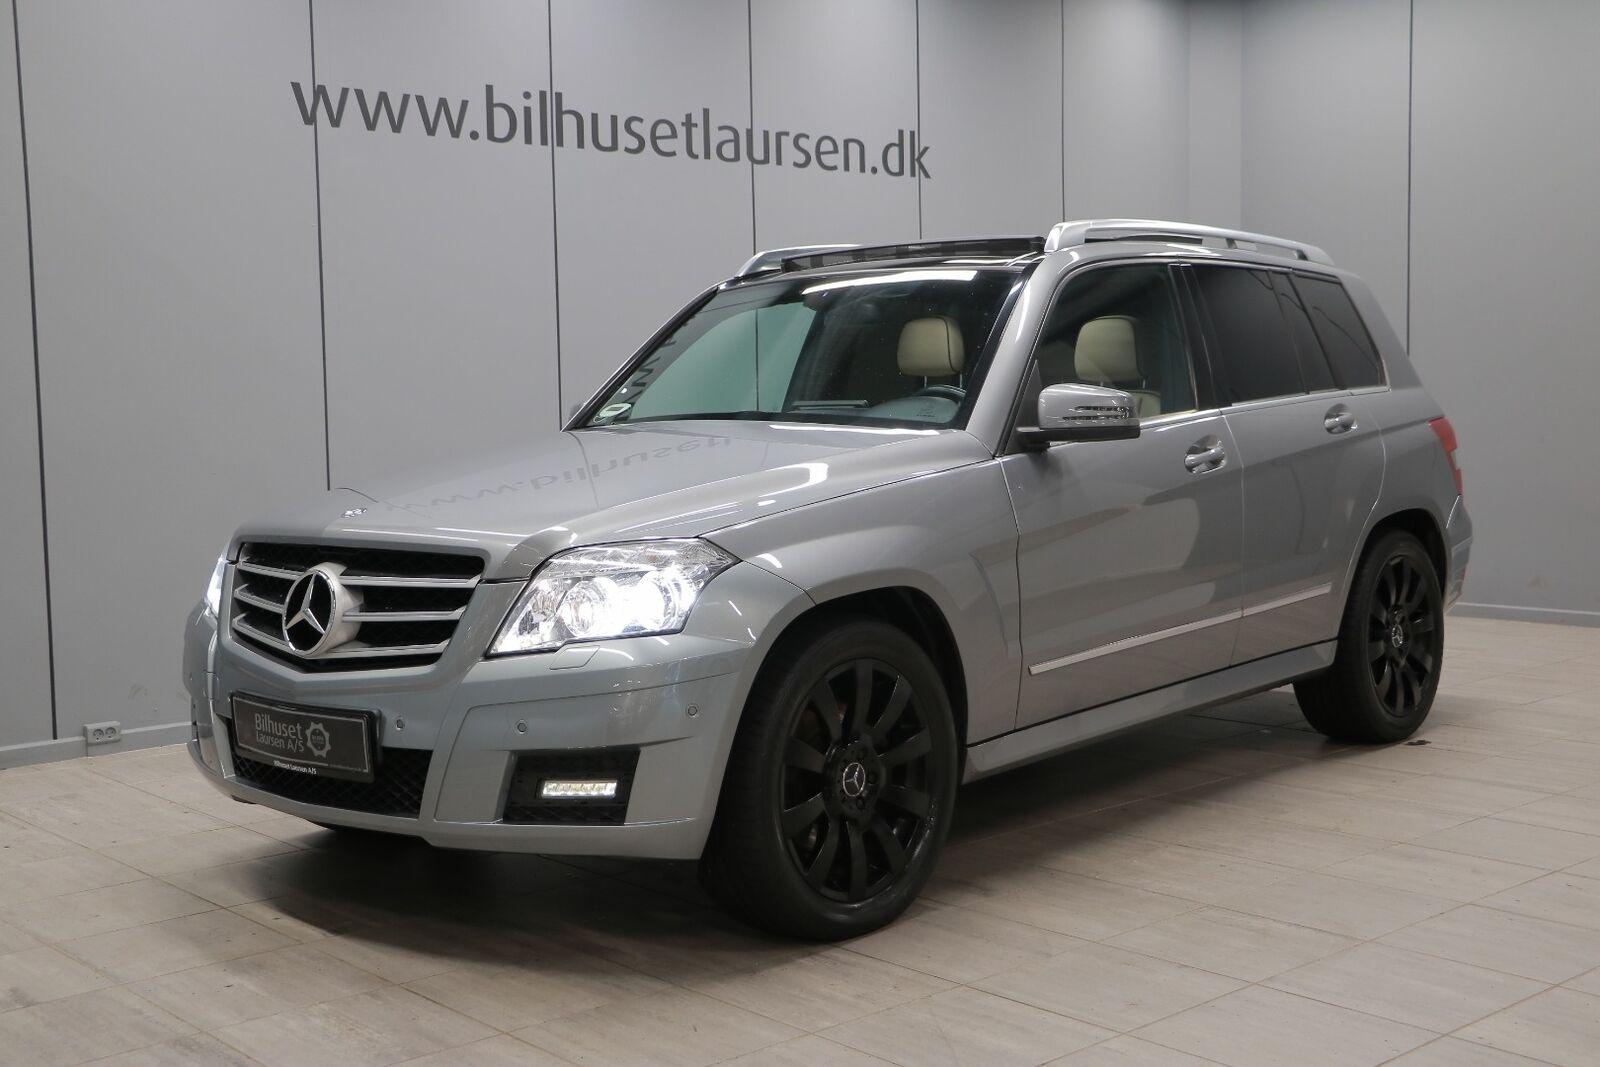 Mercedes GLK350 3,0 CDi aut. 4Matic 5d - 229.900 kr.